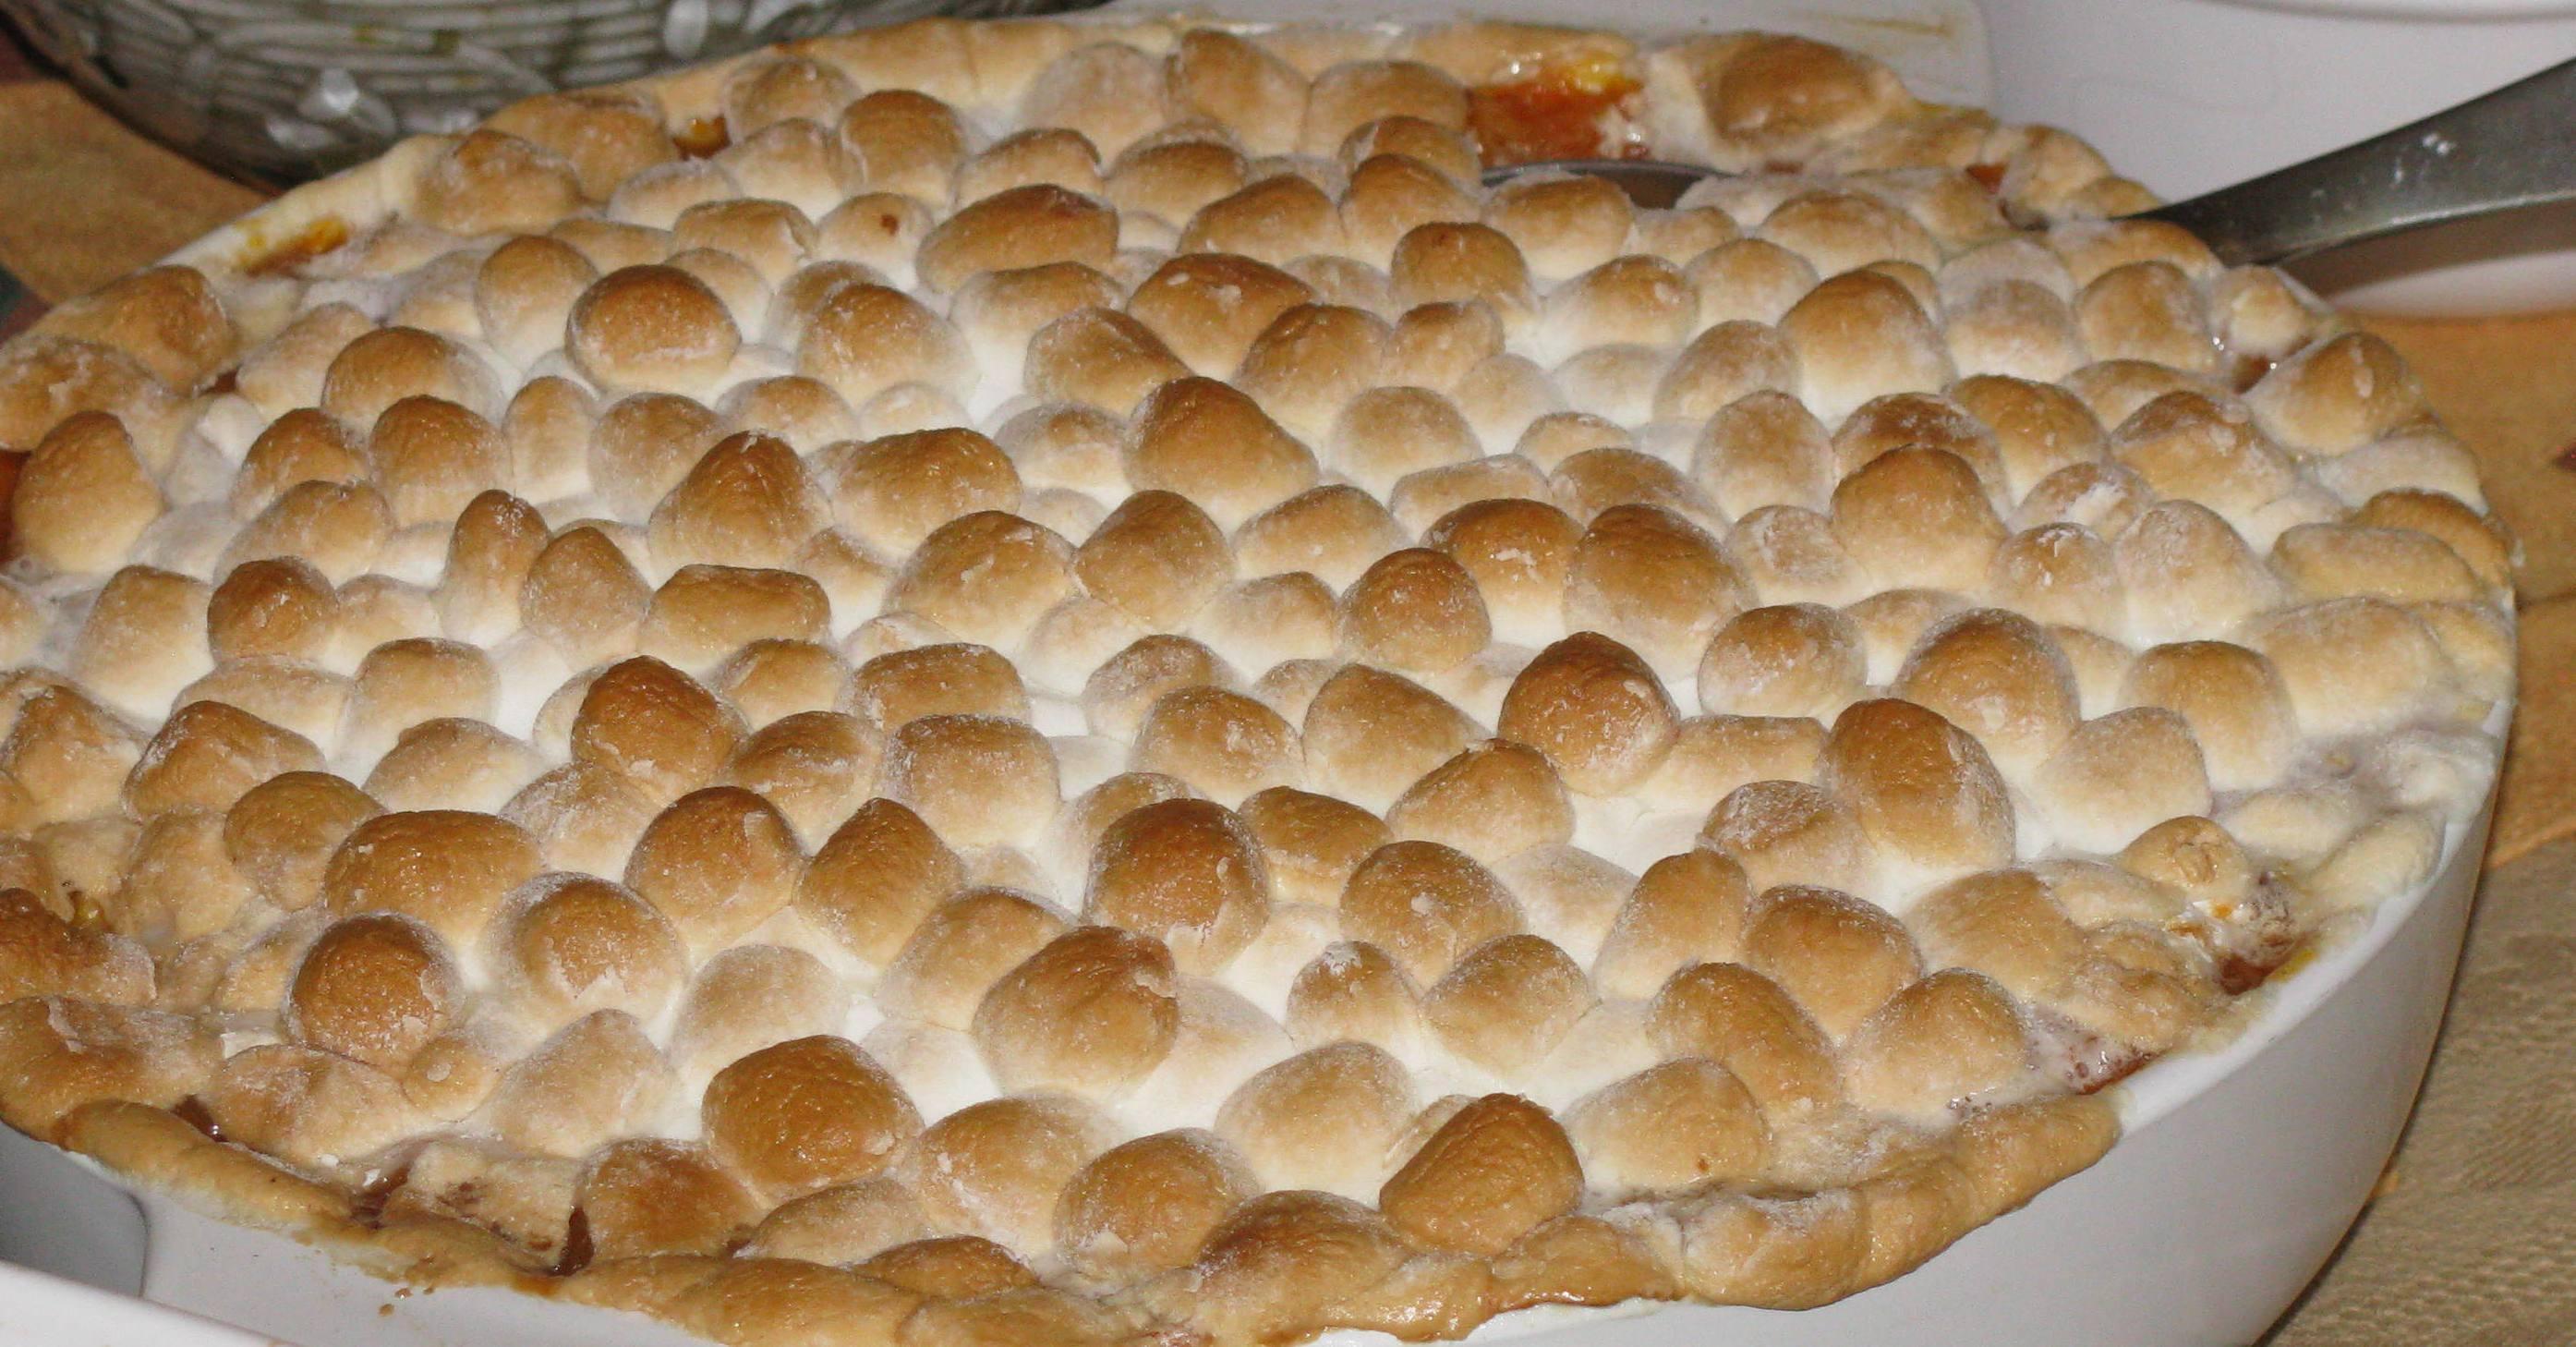 Sweet Potatoes Thanksgiving Marshmallows  Sweet Potatoes with Marshmallow